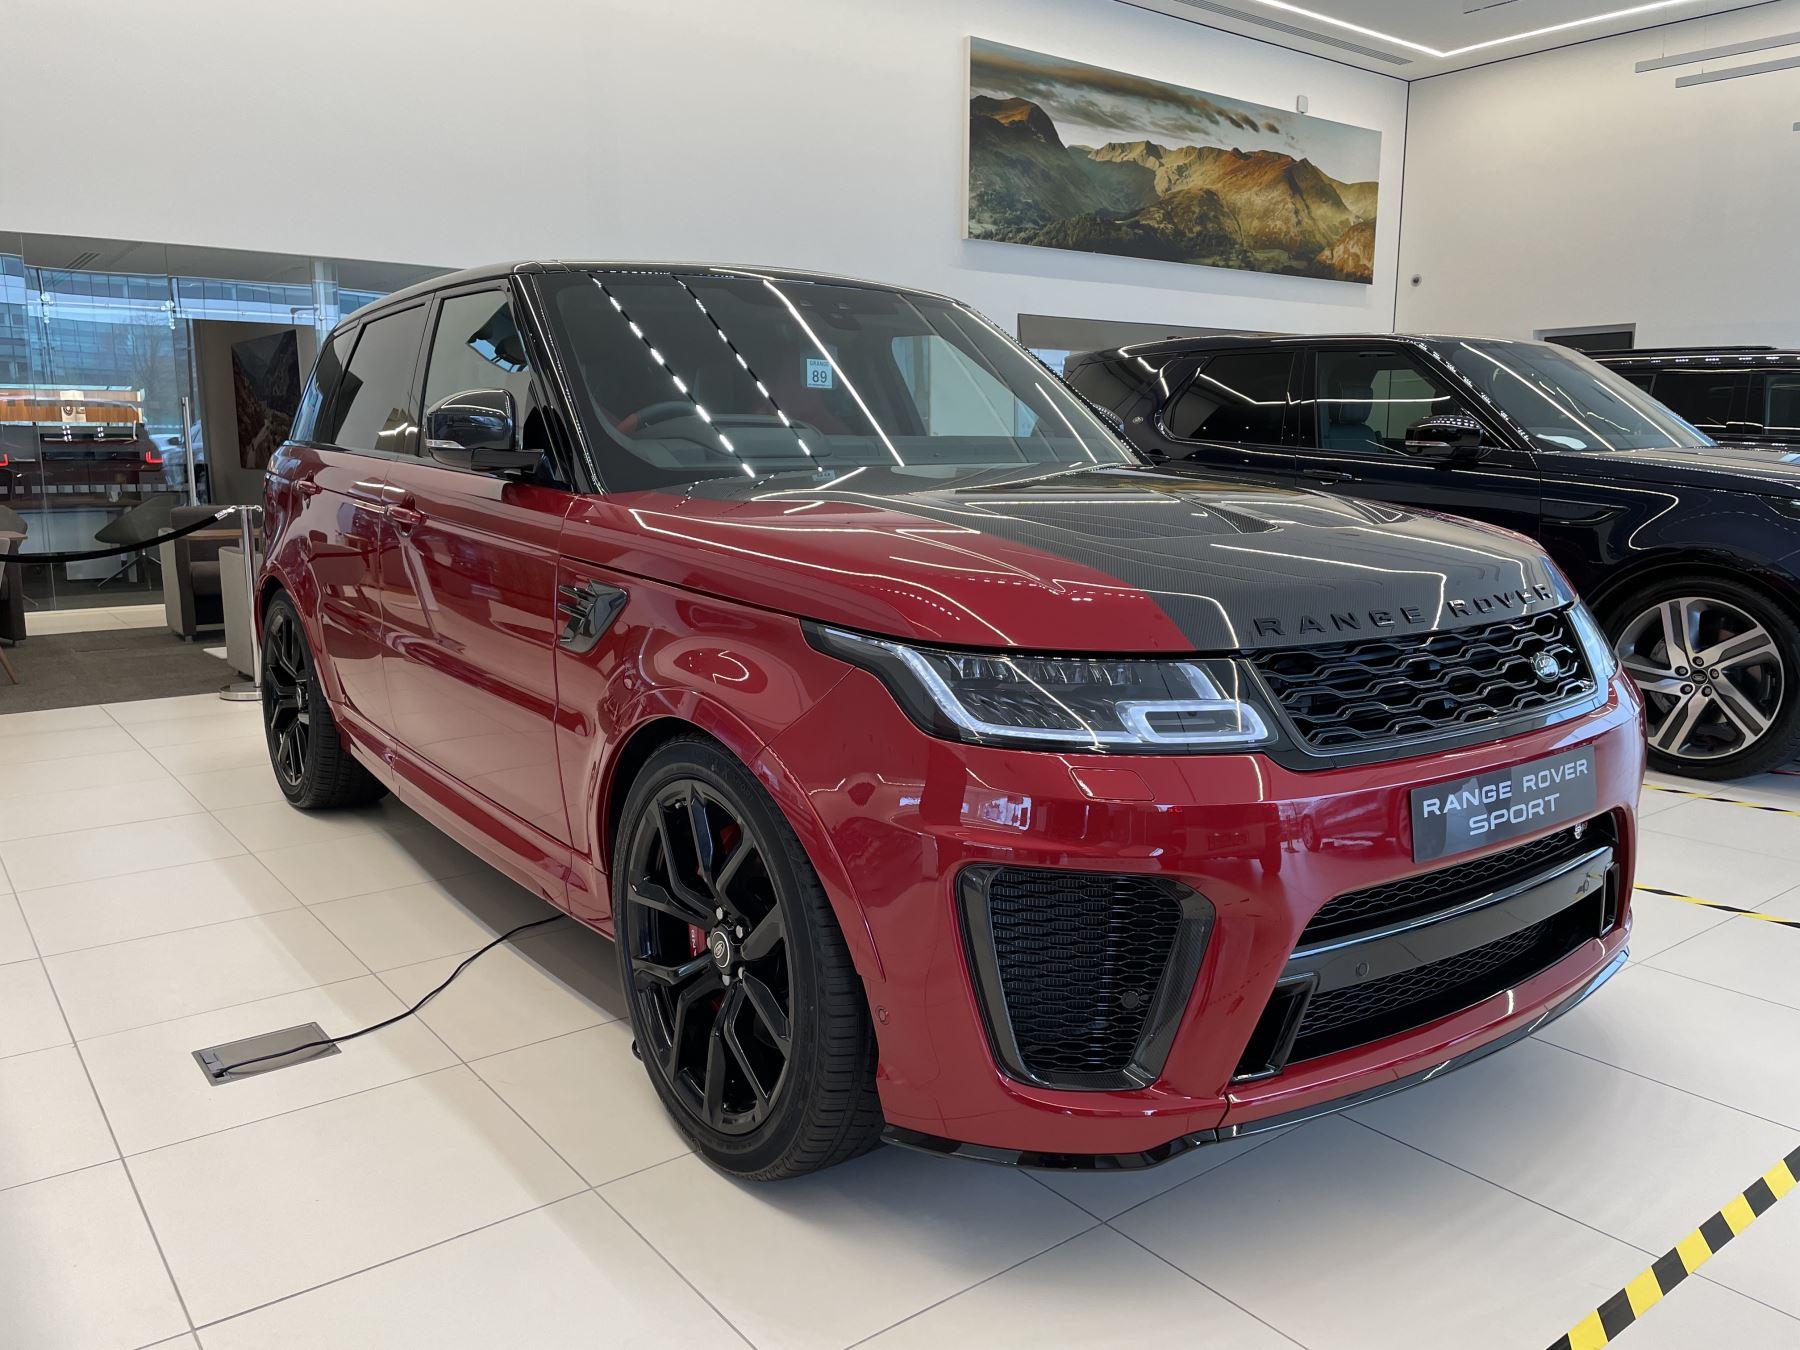 Land Rover Range Rover Sport 5.0 P575 S/C SVR Automatic 5 door 4x4 (21MY)